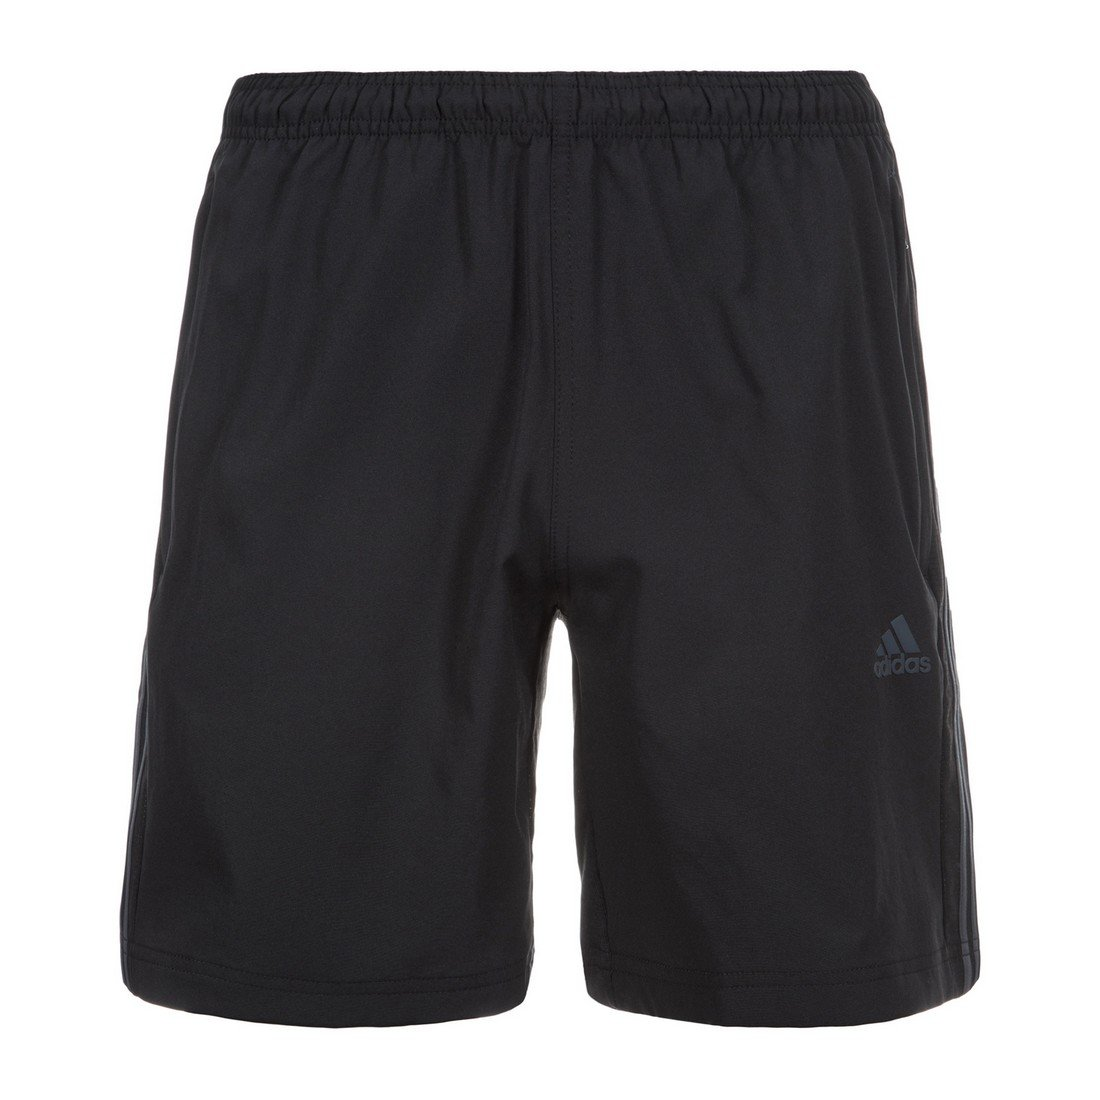 Adidas Cool365 Sh Wv Short da Uomo, Oro (Nero), S